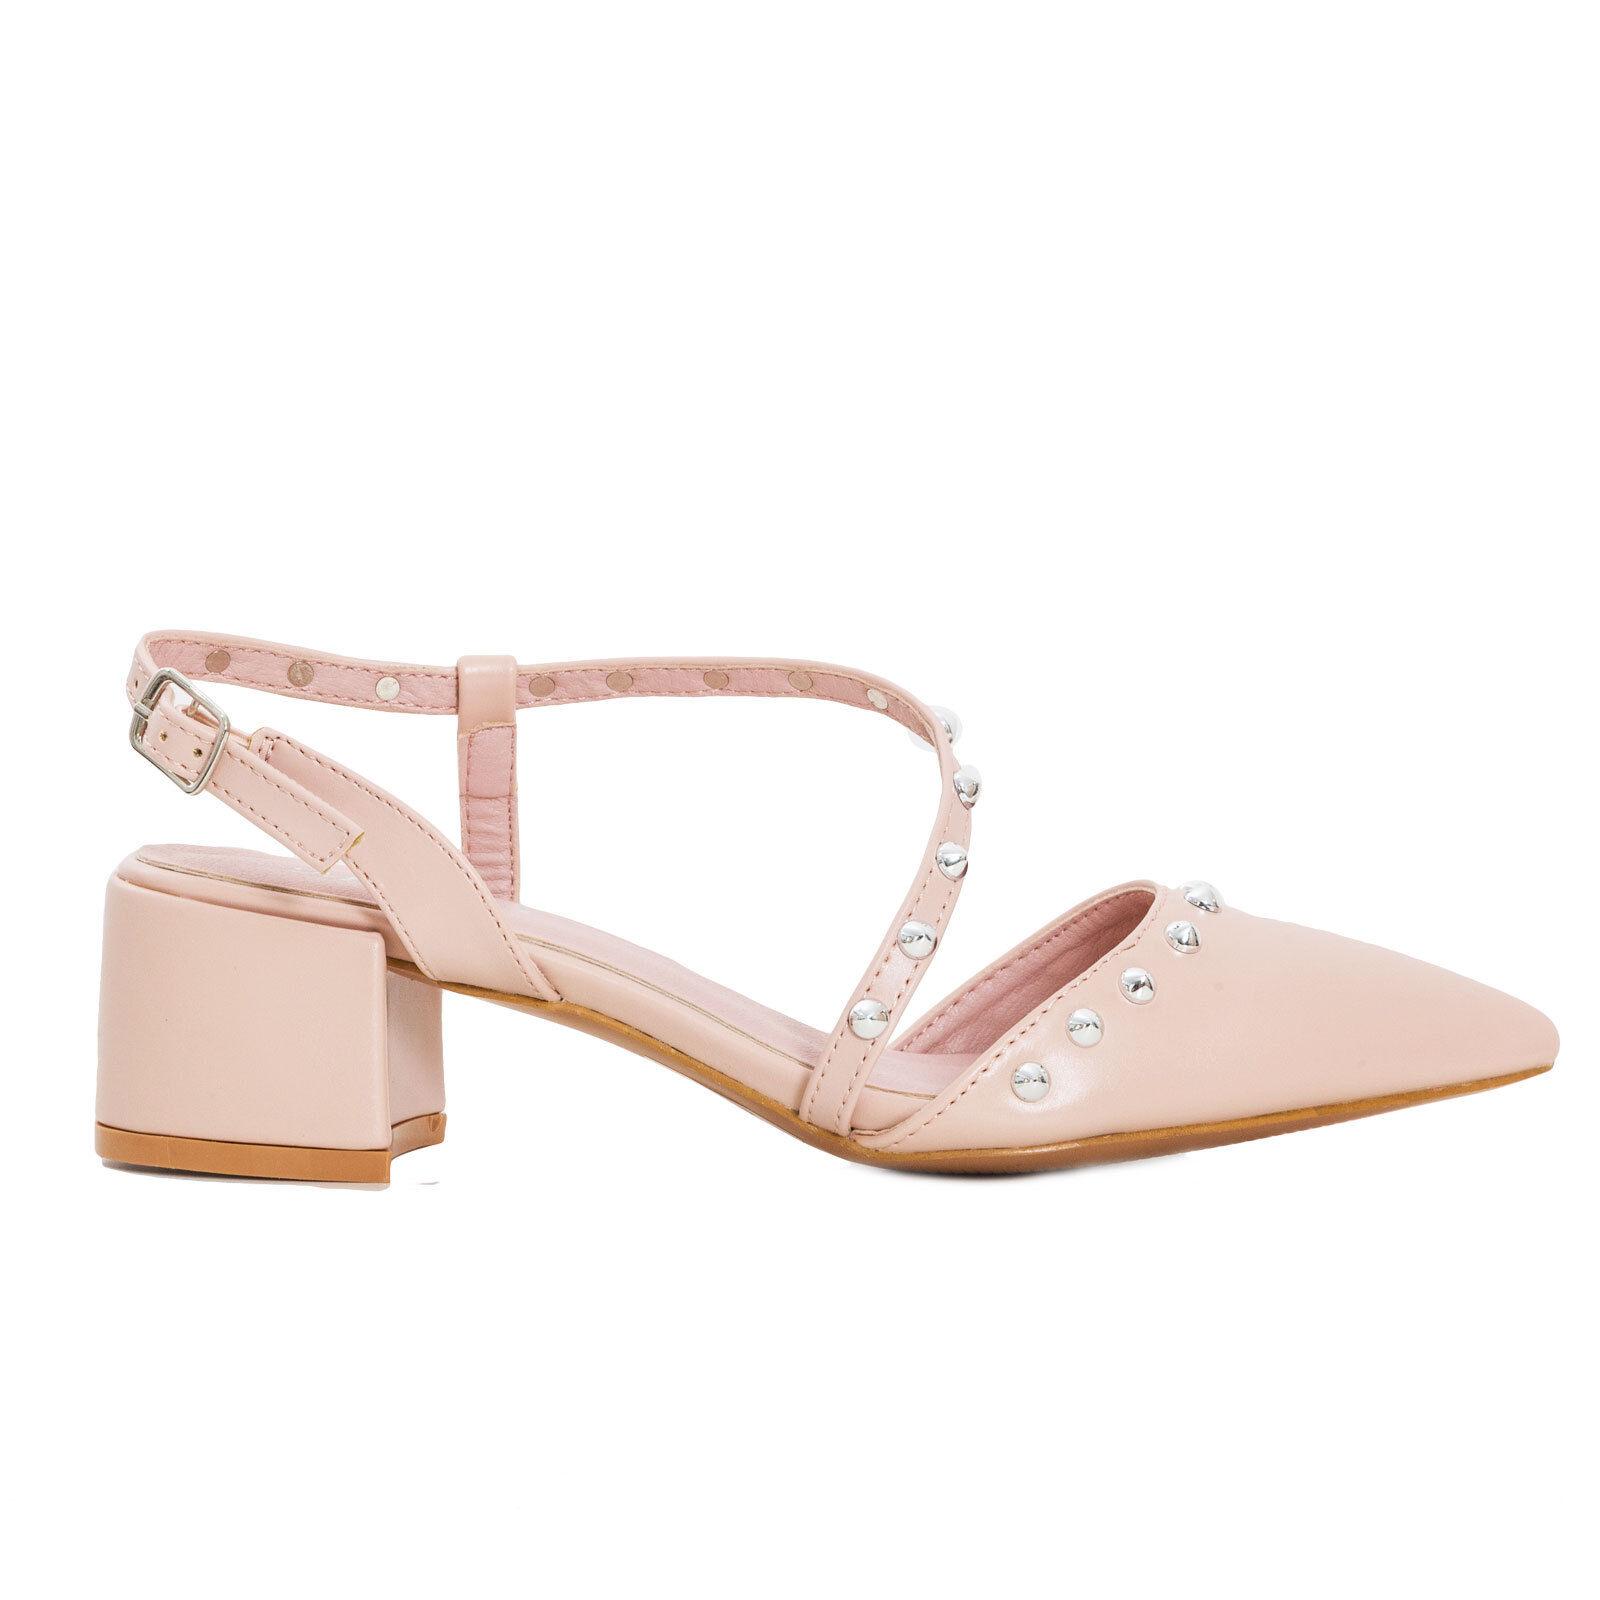 Scarpe donna punta sabot sandali decollete punta donna borchie tacco grosso eleganti ZA6330 8e5d9a